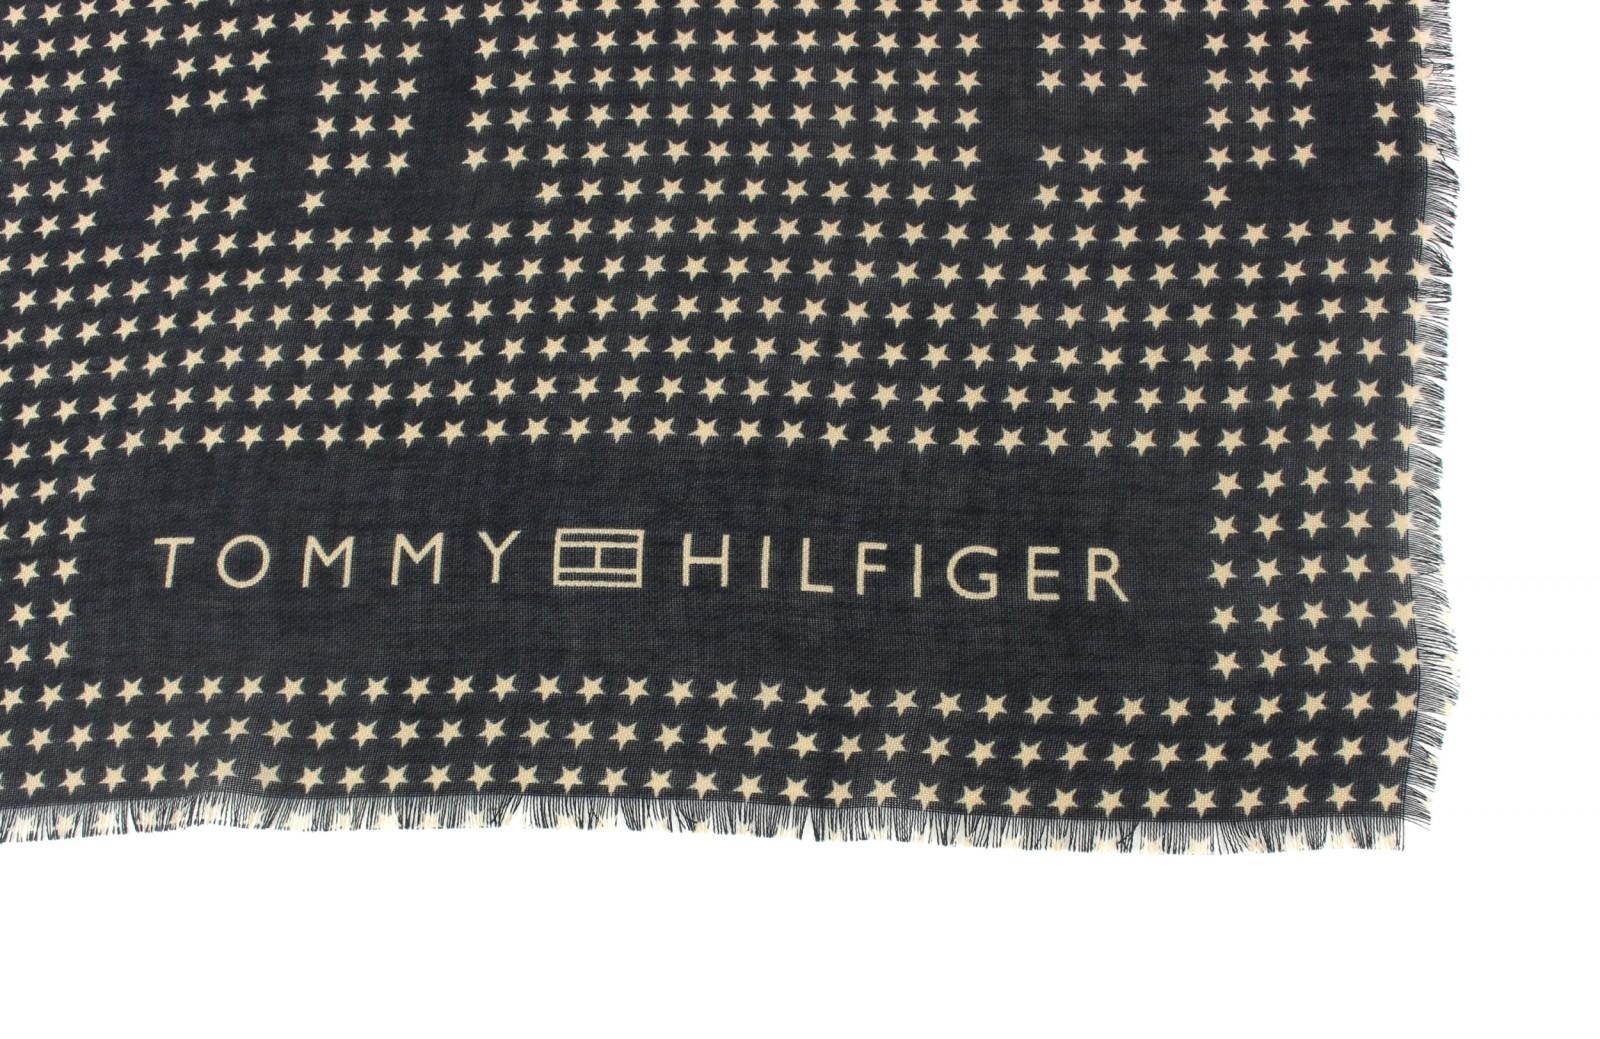 tommy hilfiger th stars scarf schal tuch halstuch damen. Black Bedroom Furniture Sets. Home Design Ideas